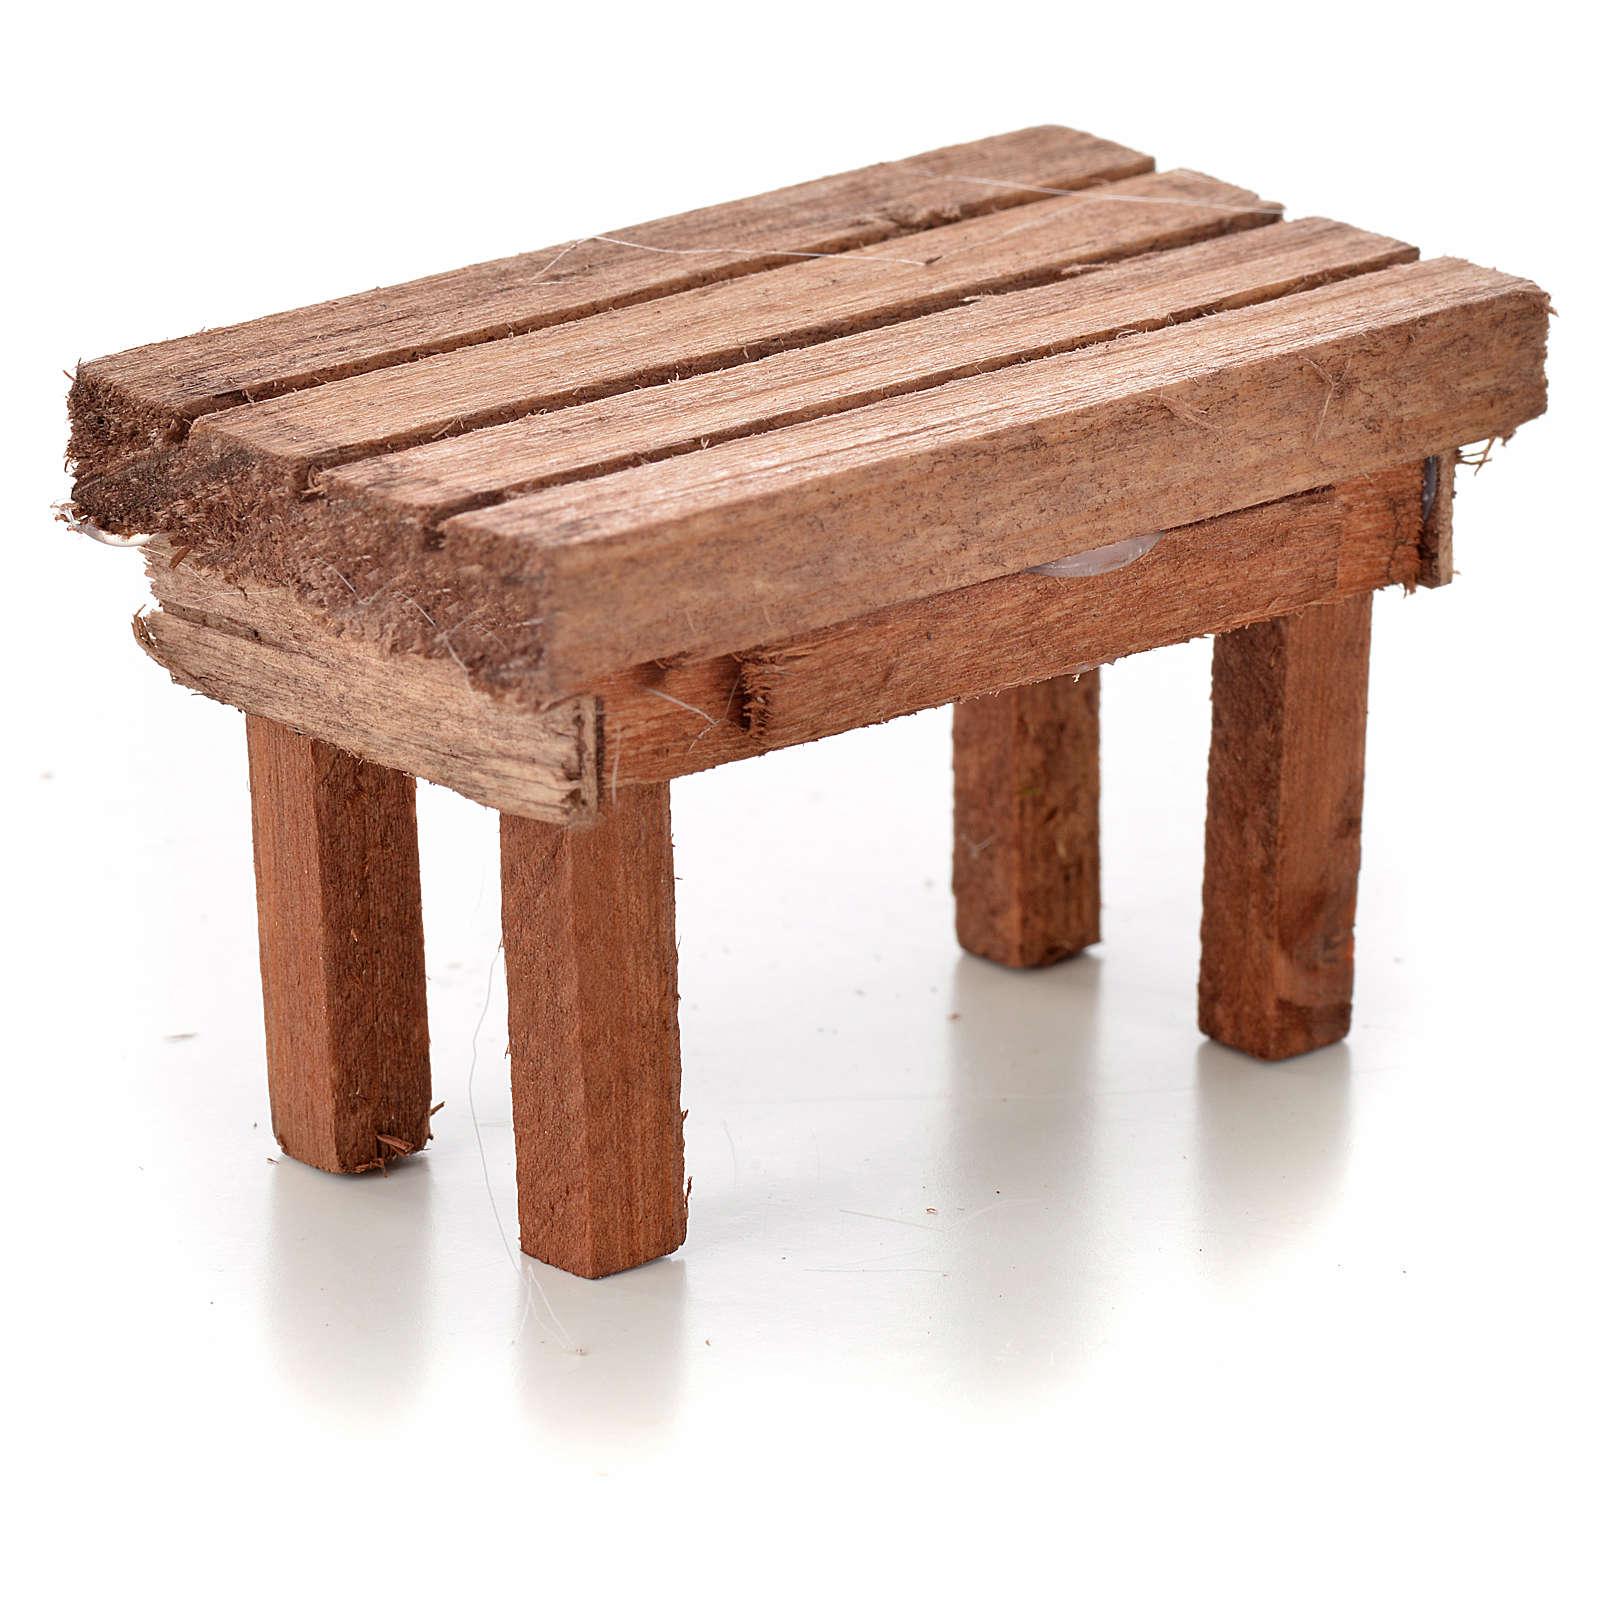 Nativity accessory, wooden table 6x3.5x3.5cm 4